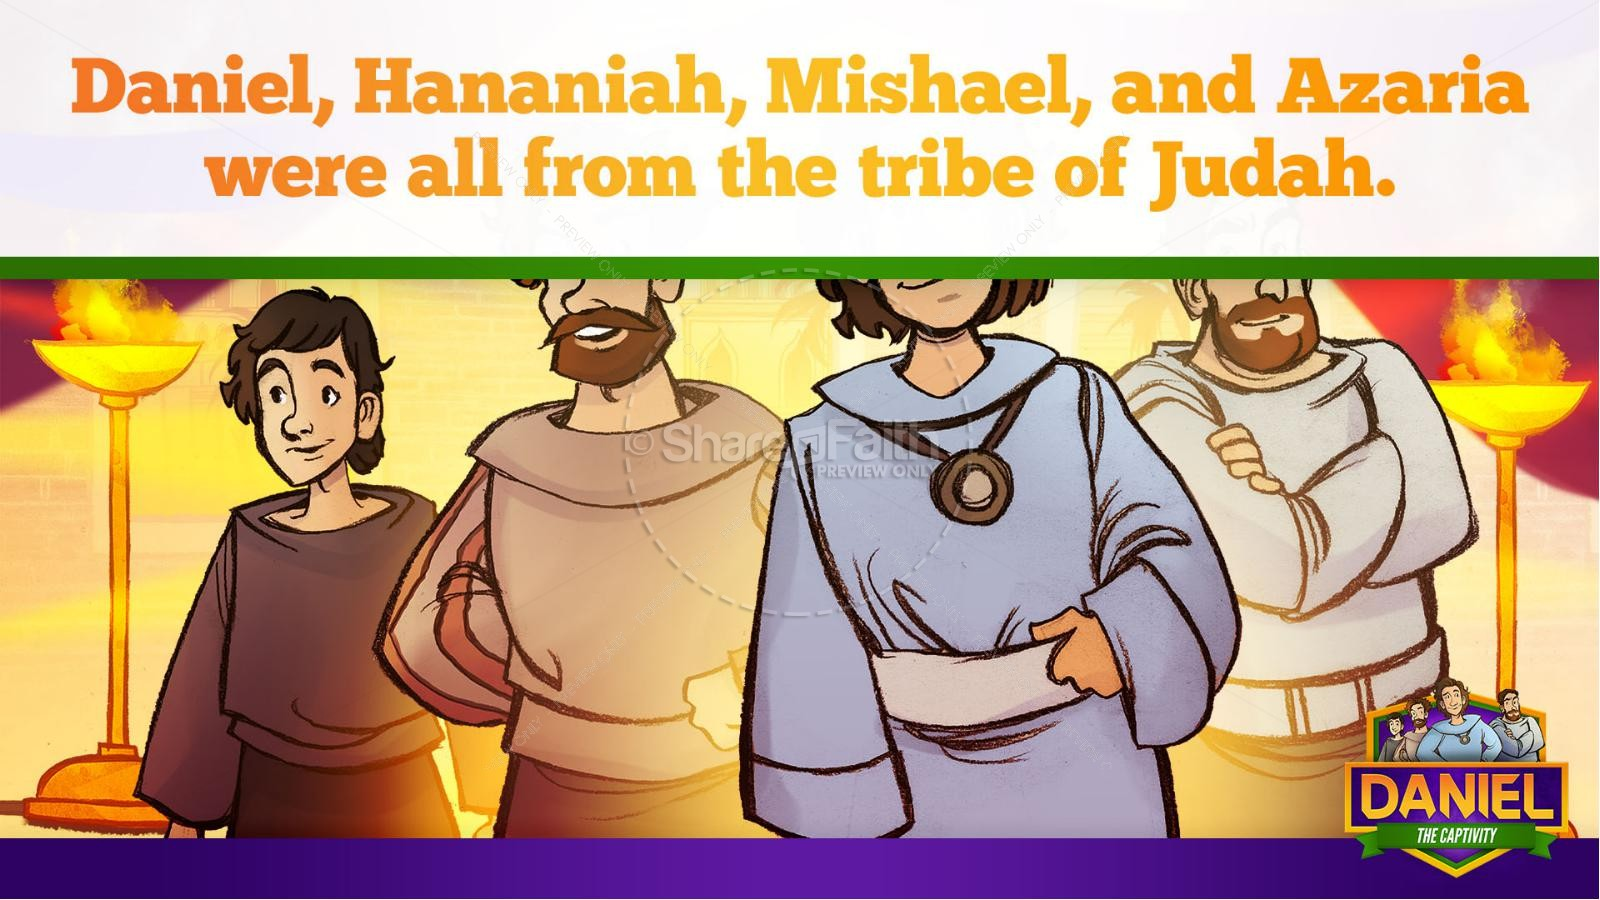 Daniel 1 The Captivity Kids Bible Story | slide 20